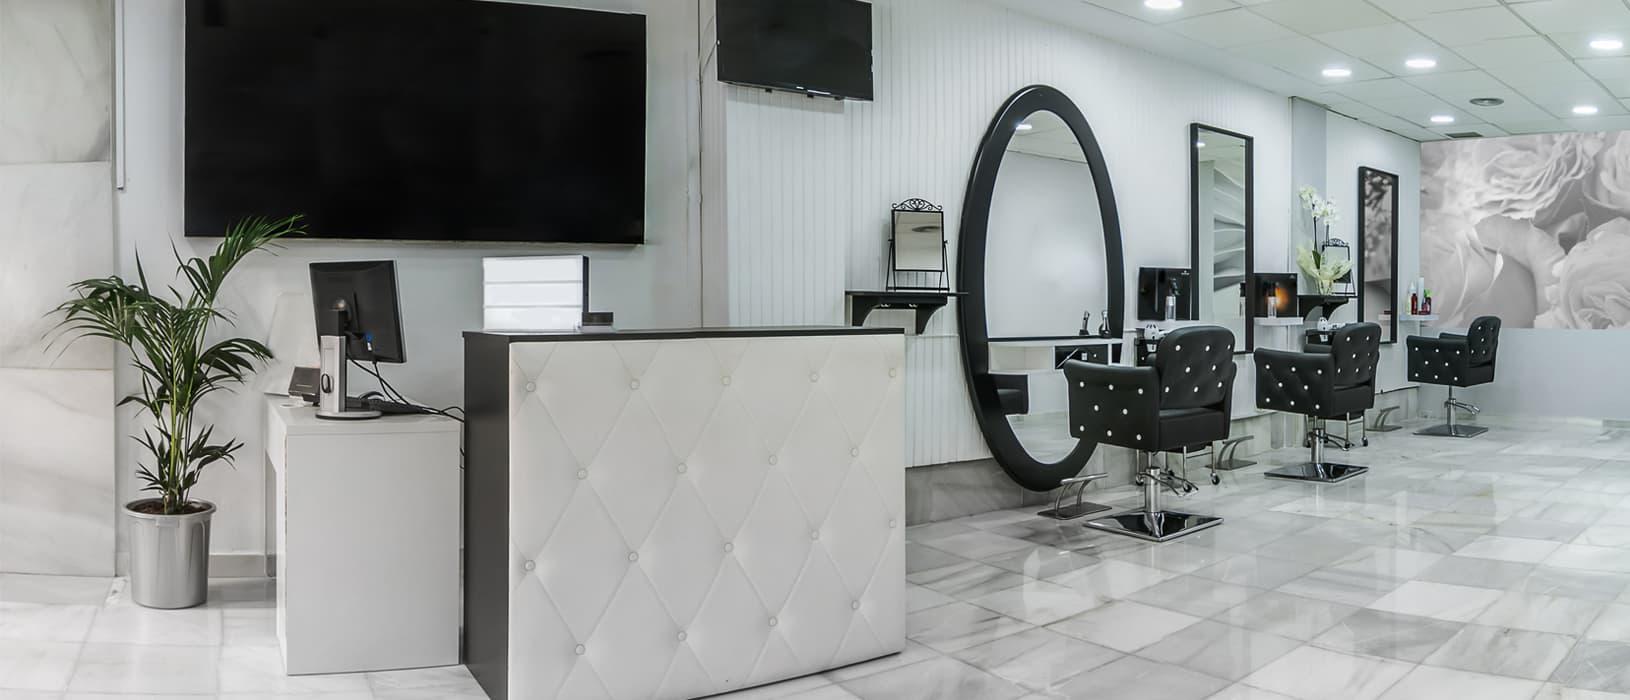 upscale hair salon